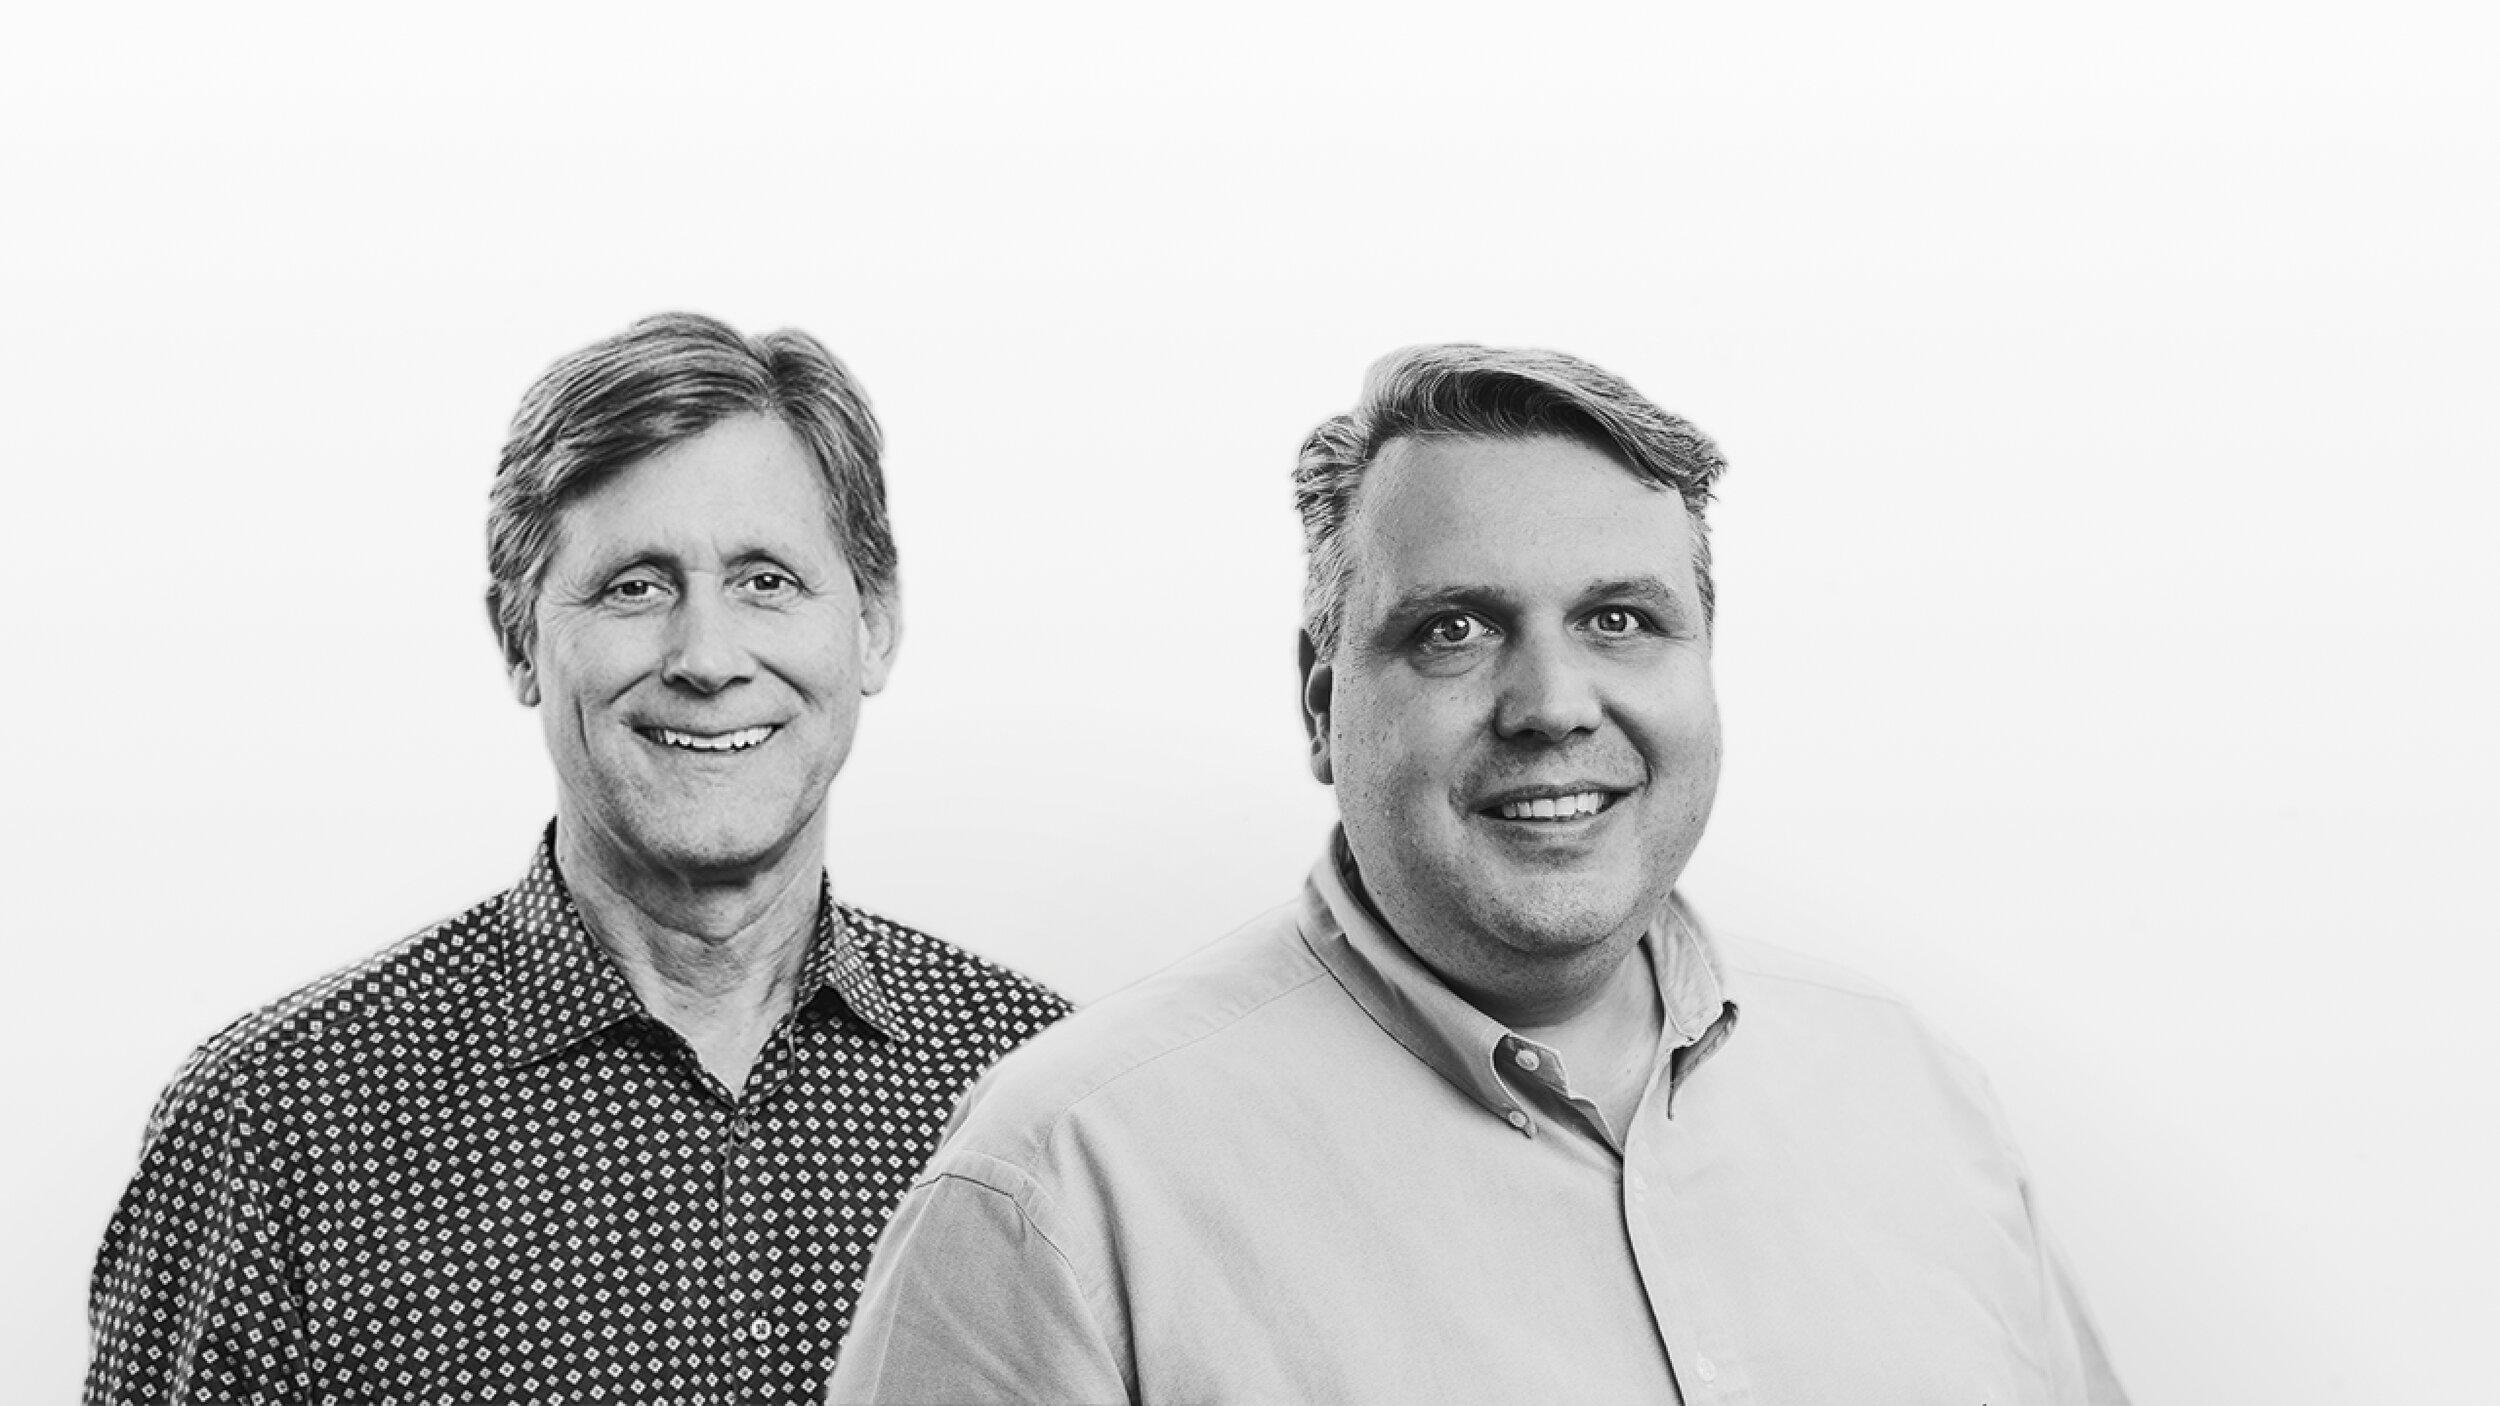 Matt Koertge & Mark Sherman: Telstra Ventures' Managing Directors - Revealing the insights to managing Australia's most successful venture capital firm.